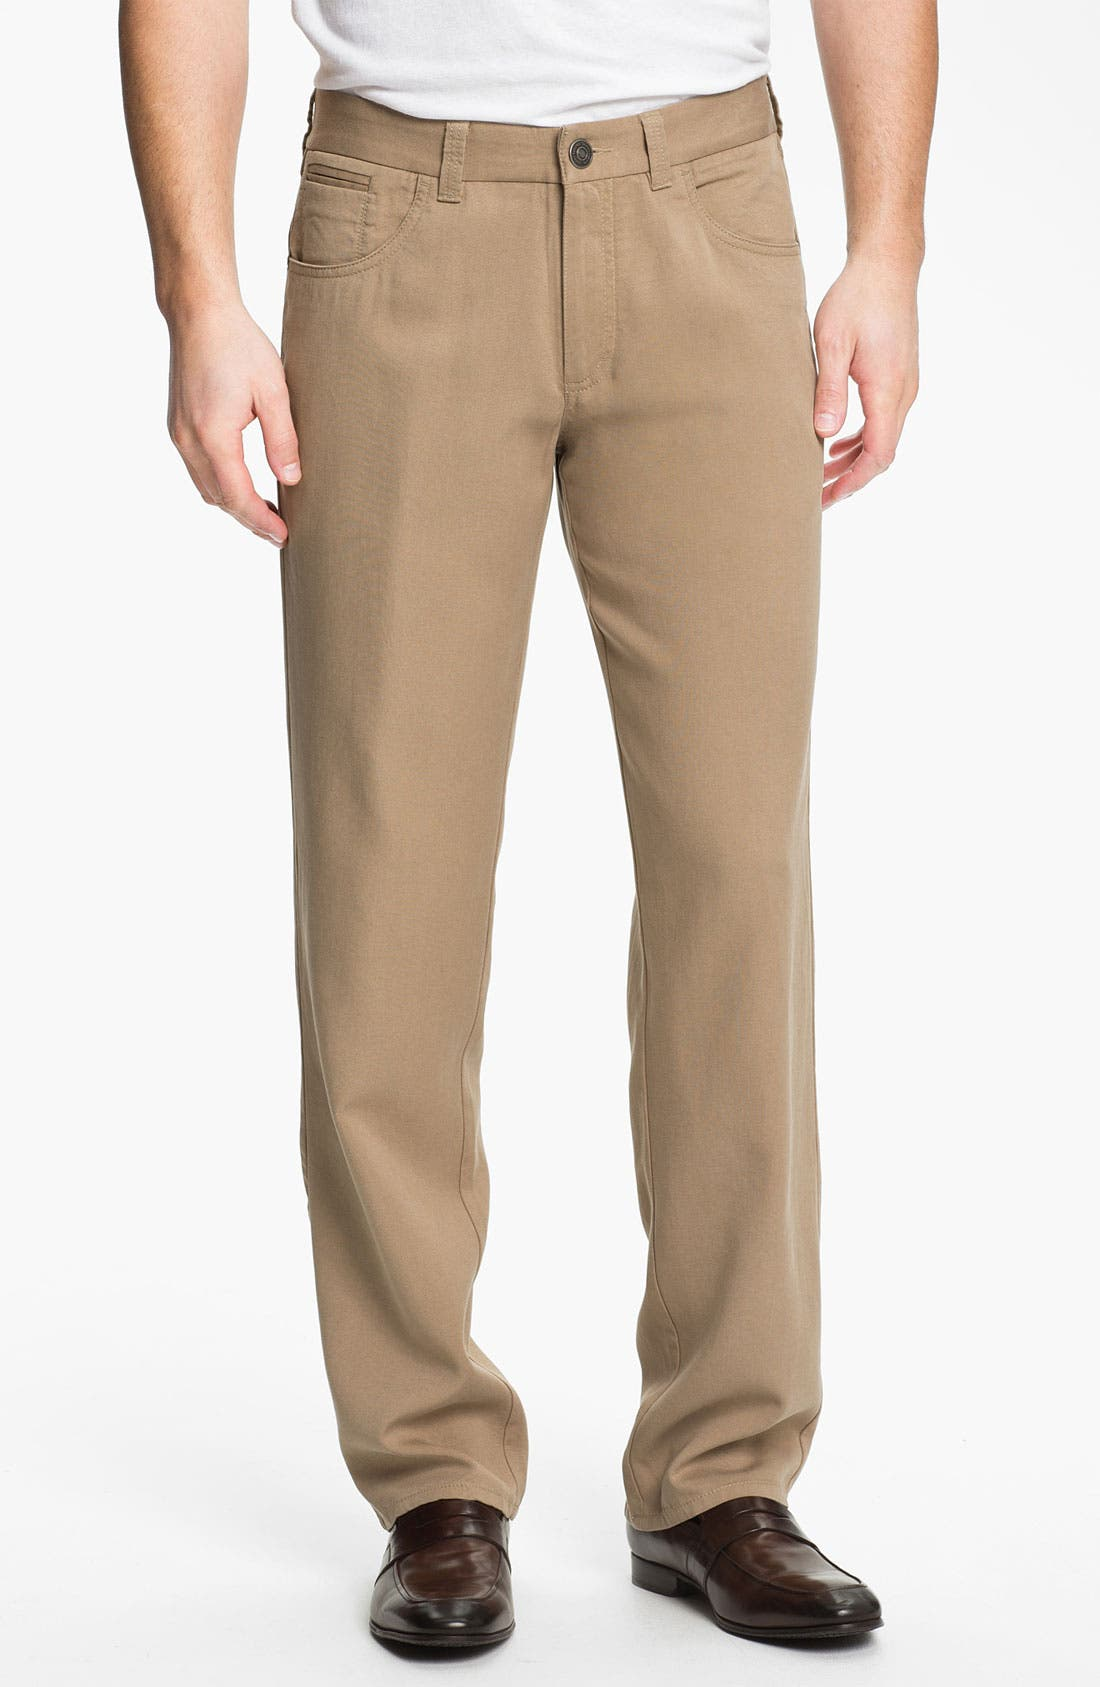 Main Image - Tommy Bahama 'Bora Bora' Five Pocket Pants